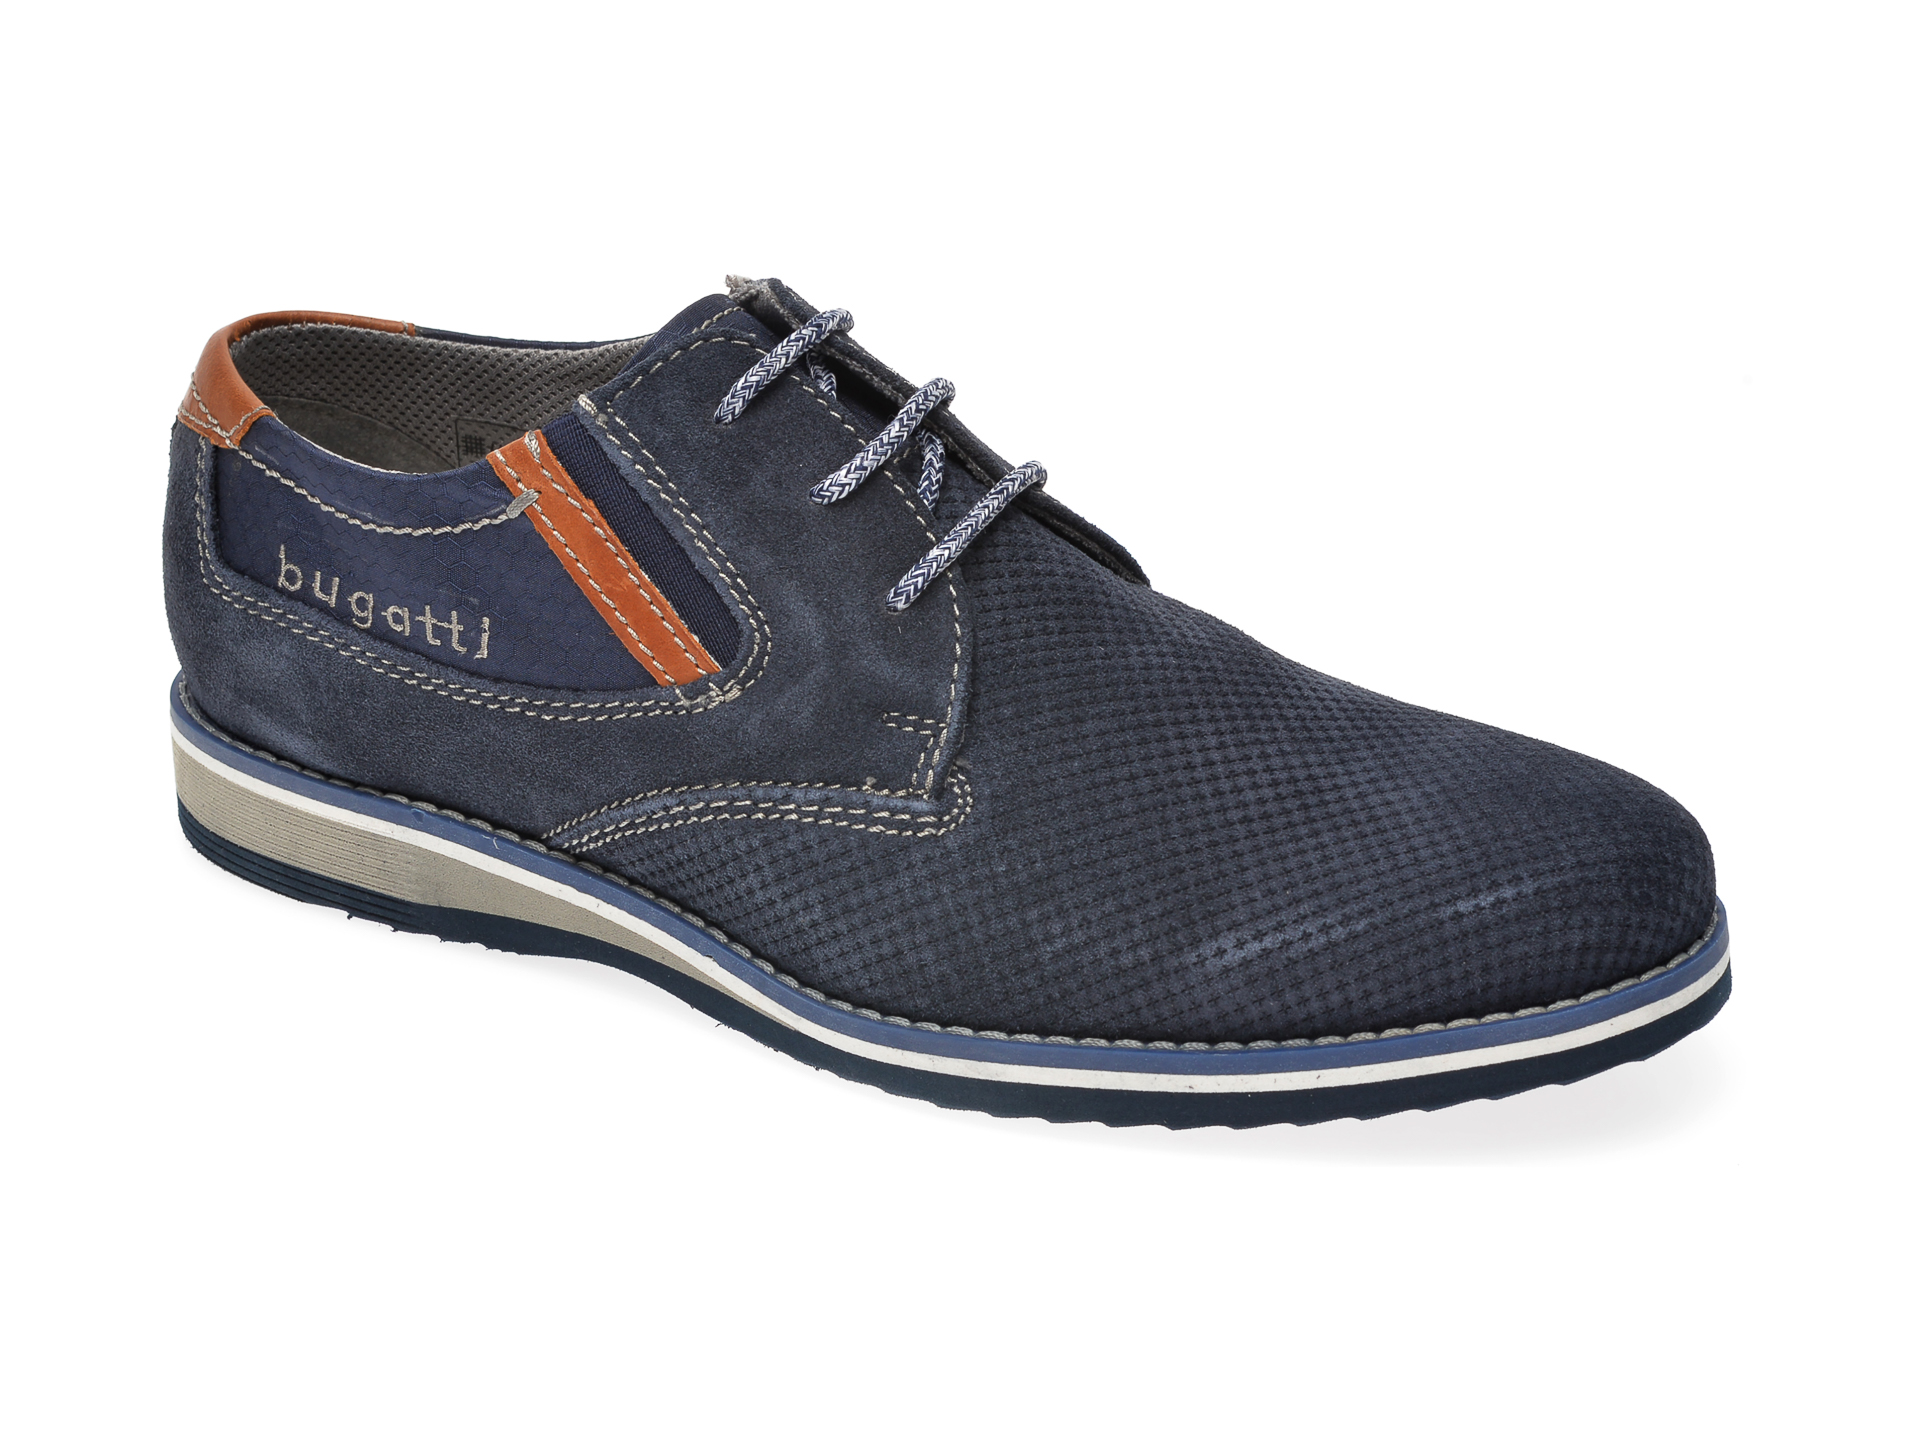 Pantofi Bugatti Bleumarin, 68404, Din Piele Intoarsa